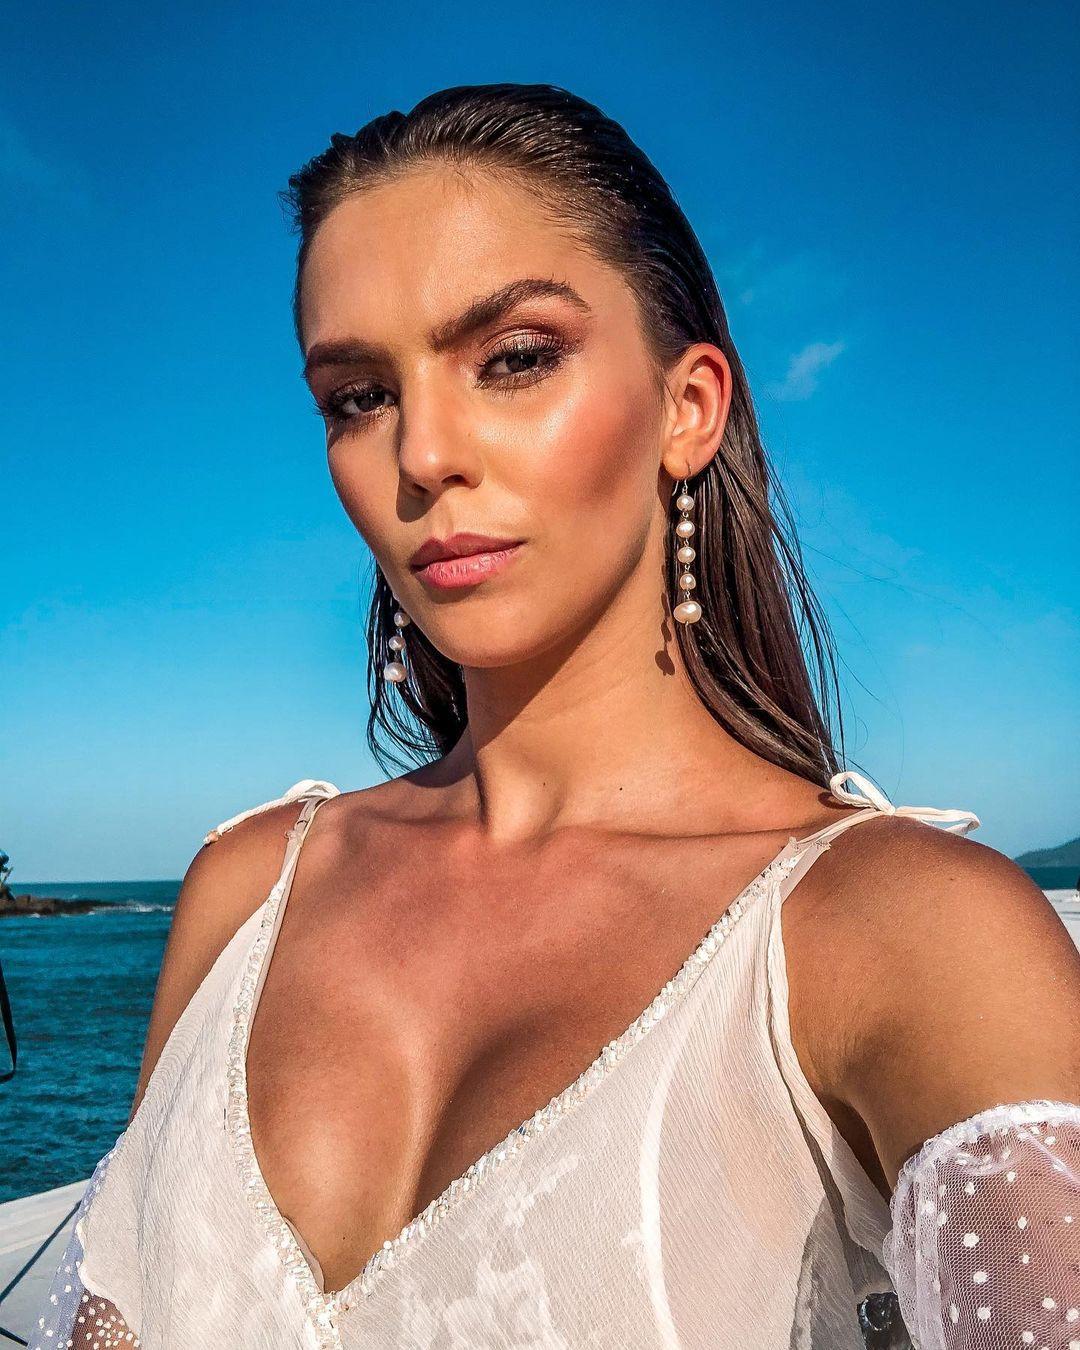 ana flavia giacomini, miss ilha dos lobos mundo 2019. - Página 2 Fvopkb10